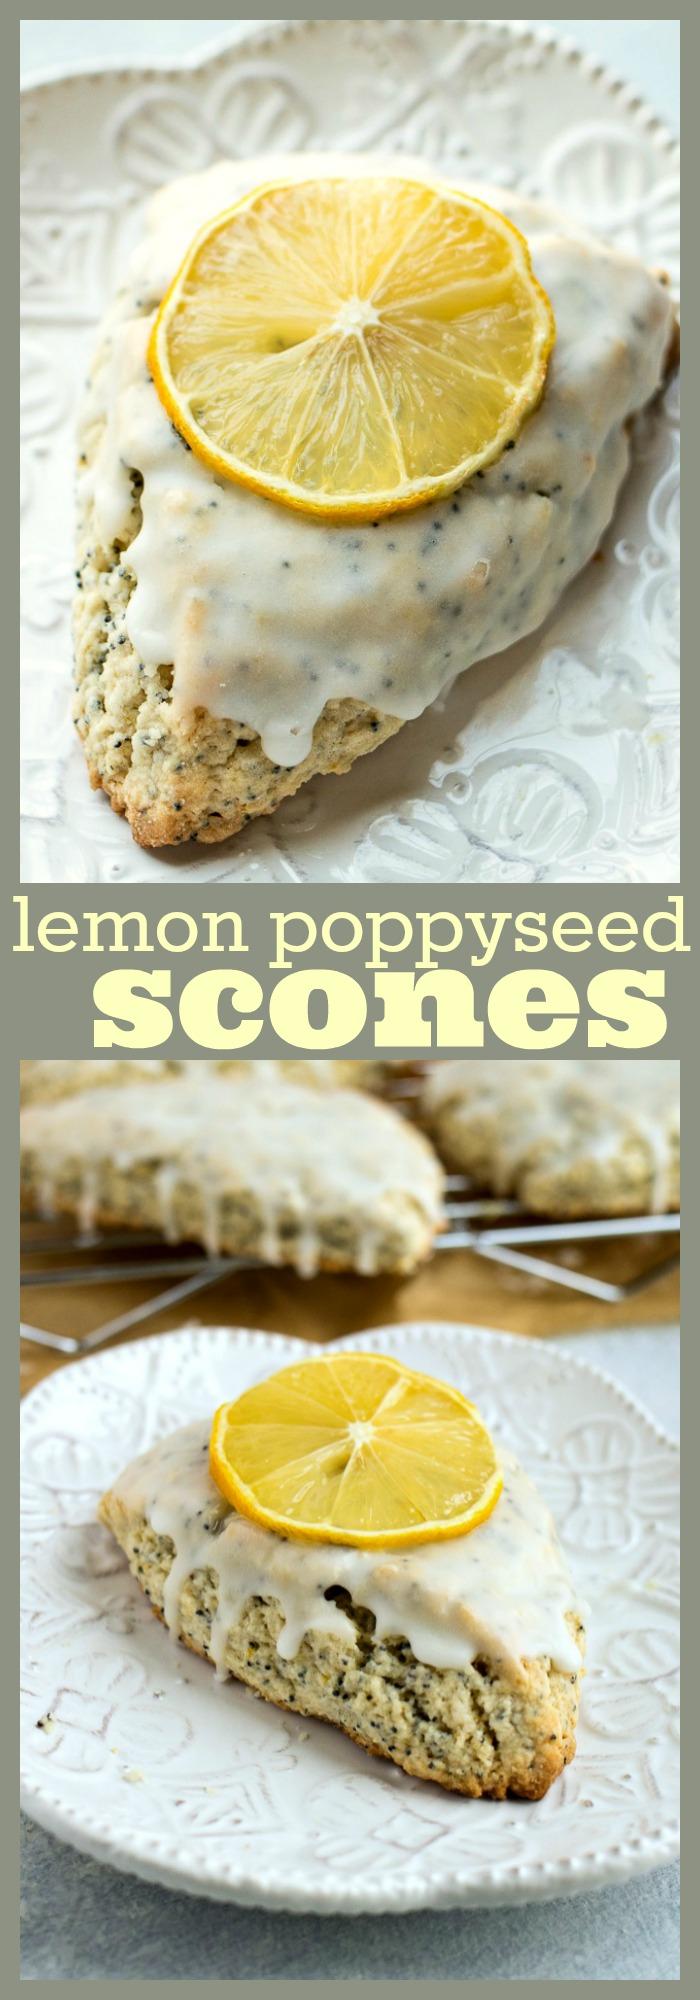 Lemon Poppyseed Scones photo collage